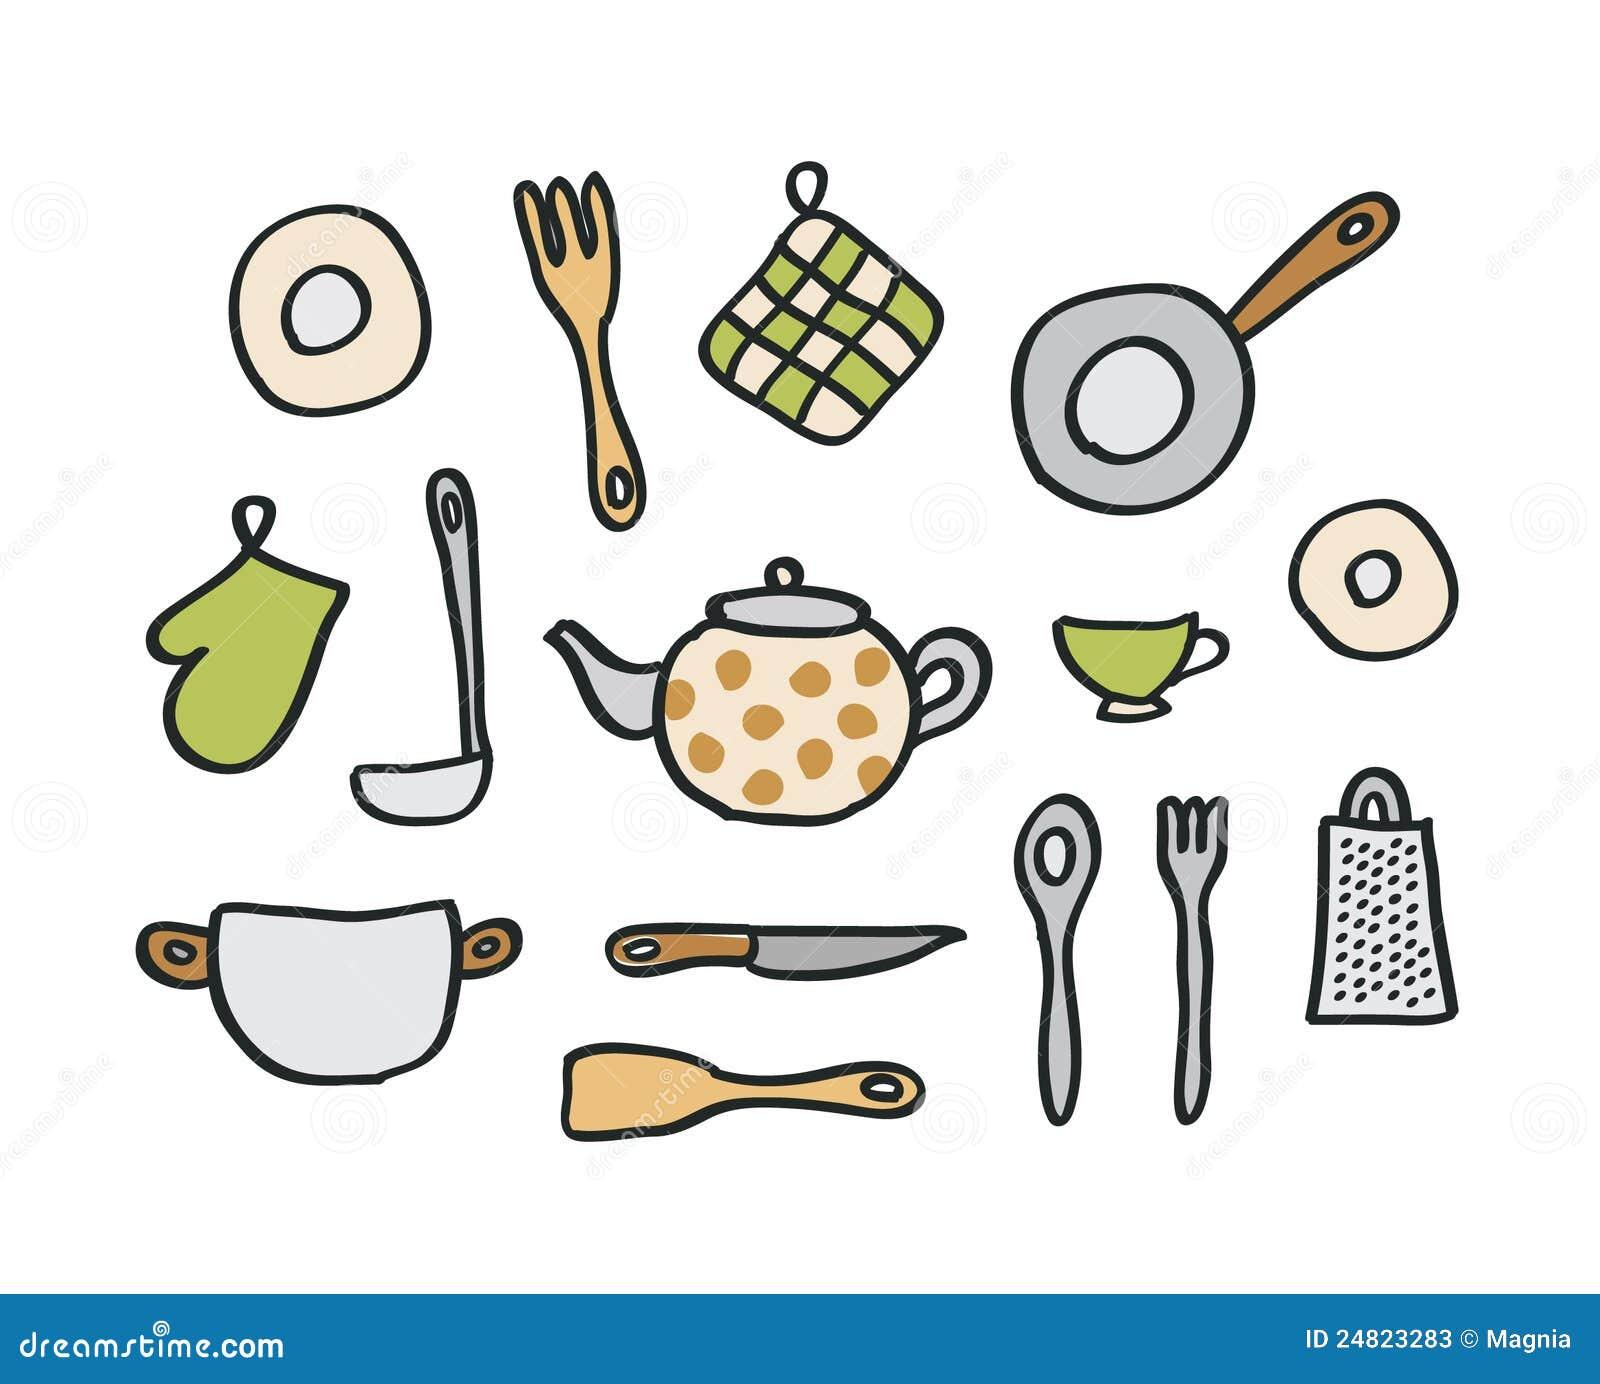 Kitchen elements stock vector illustration of plate for Elementos de cocina para chef